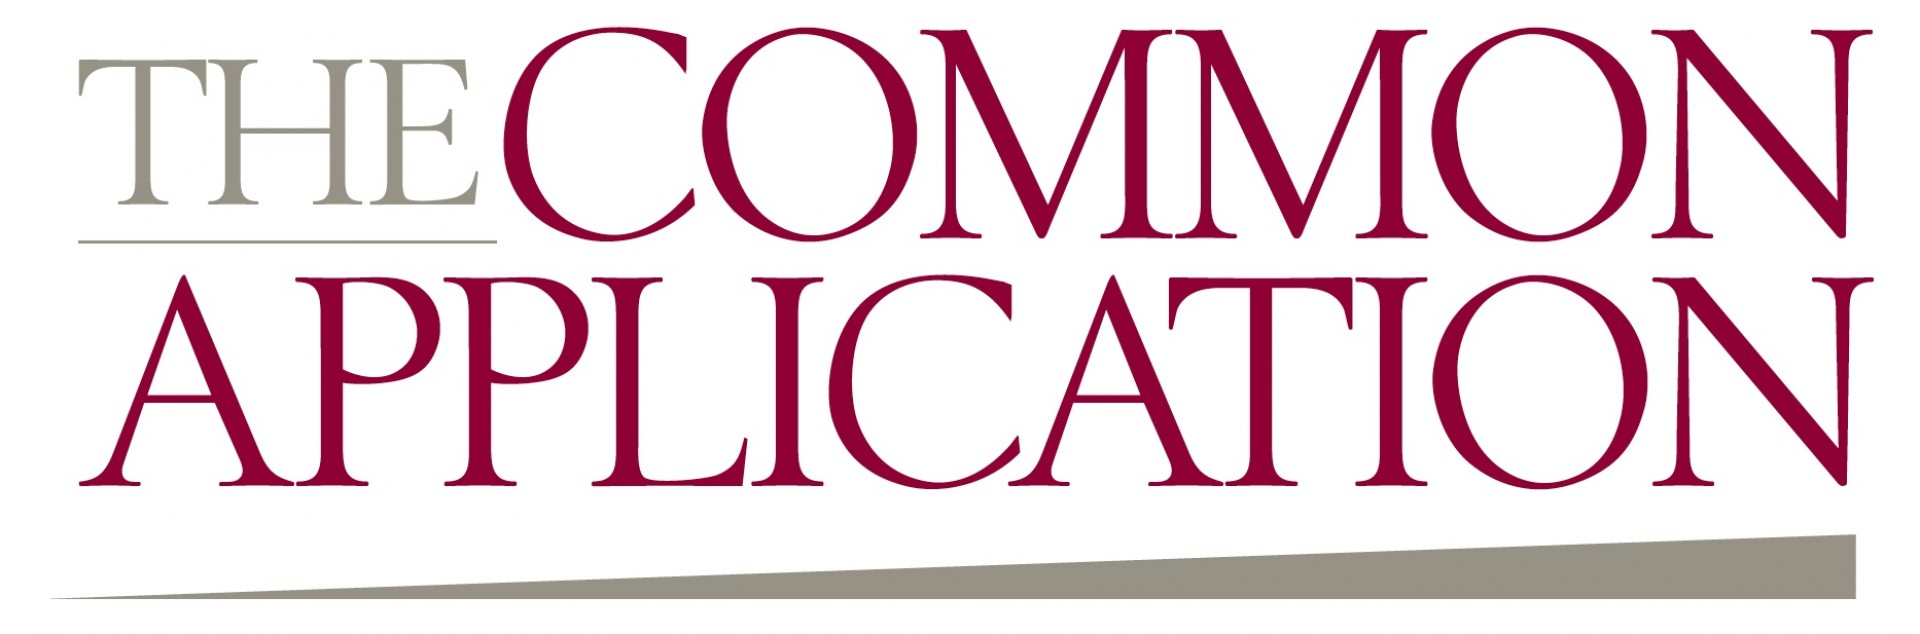 021 Common Application Logo Essay Example App Prompts Rare 2015-16 1920